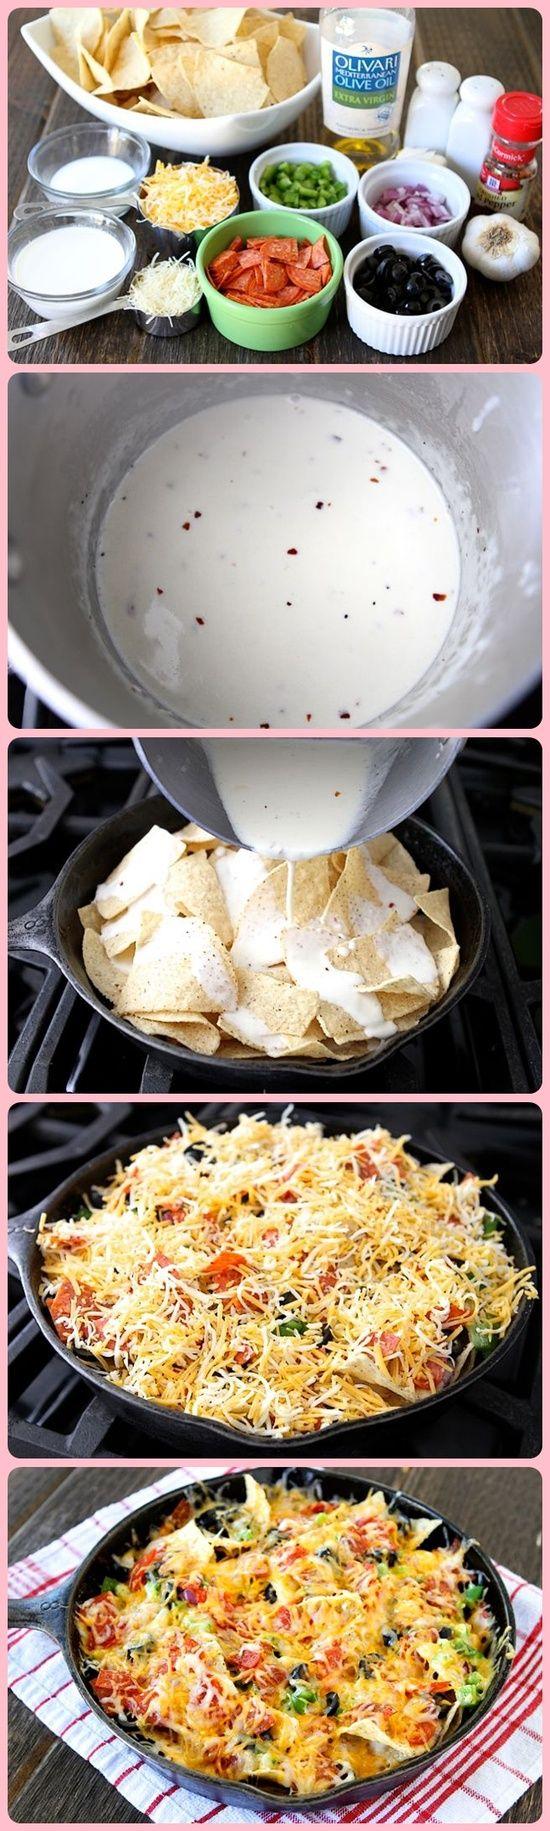 Cast iron nachos - these look so good!!!